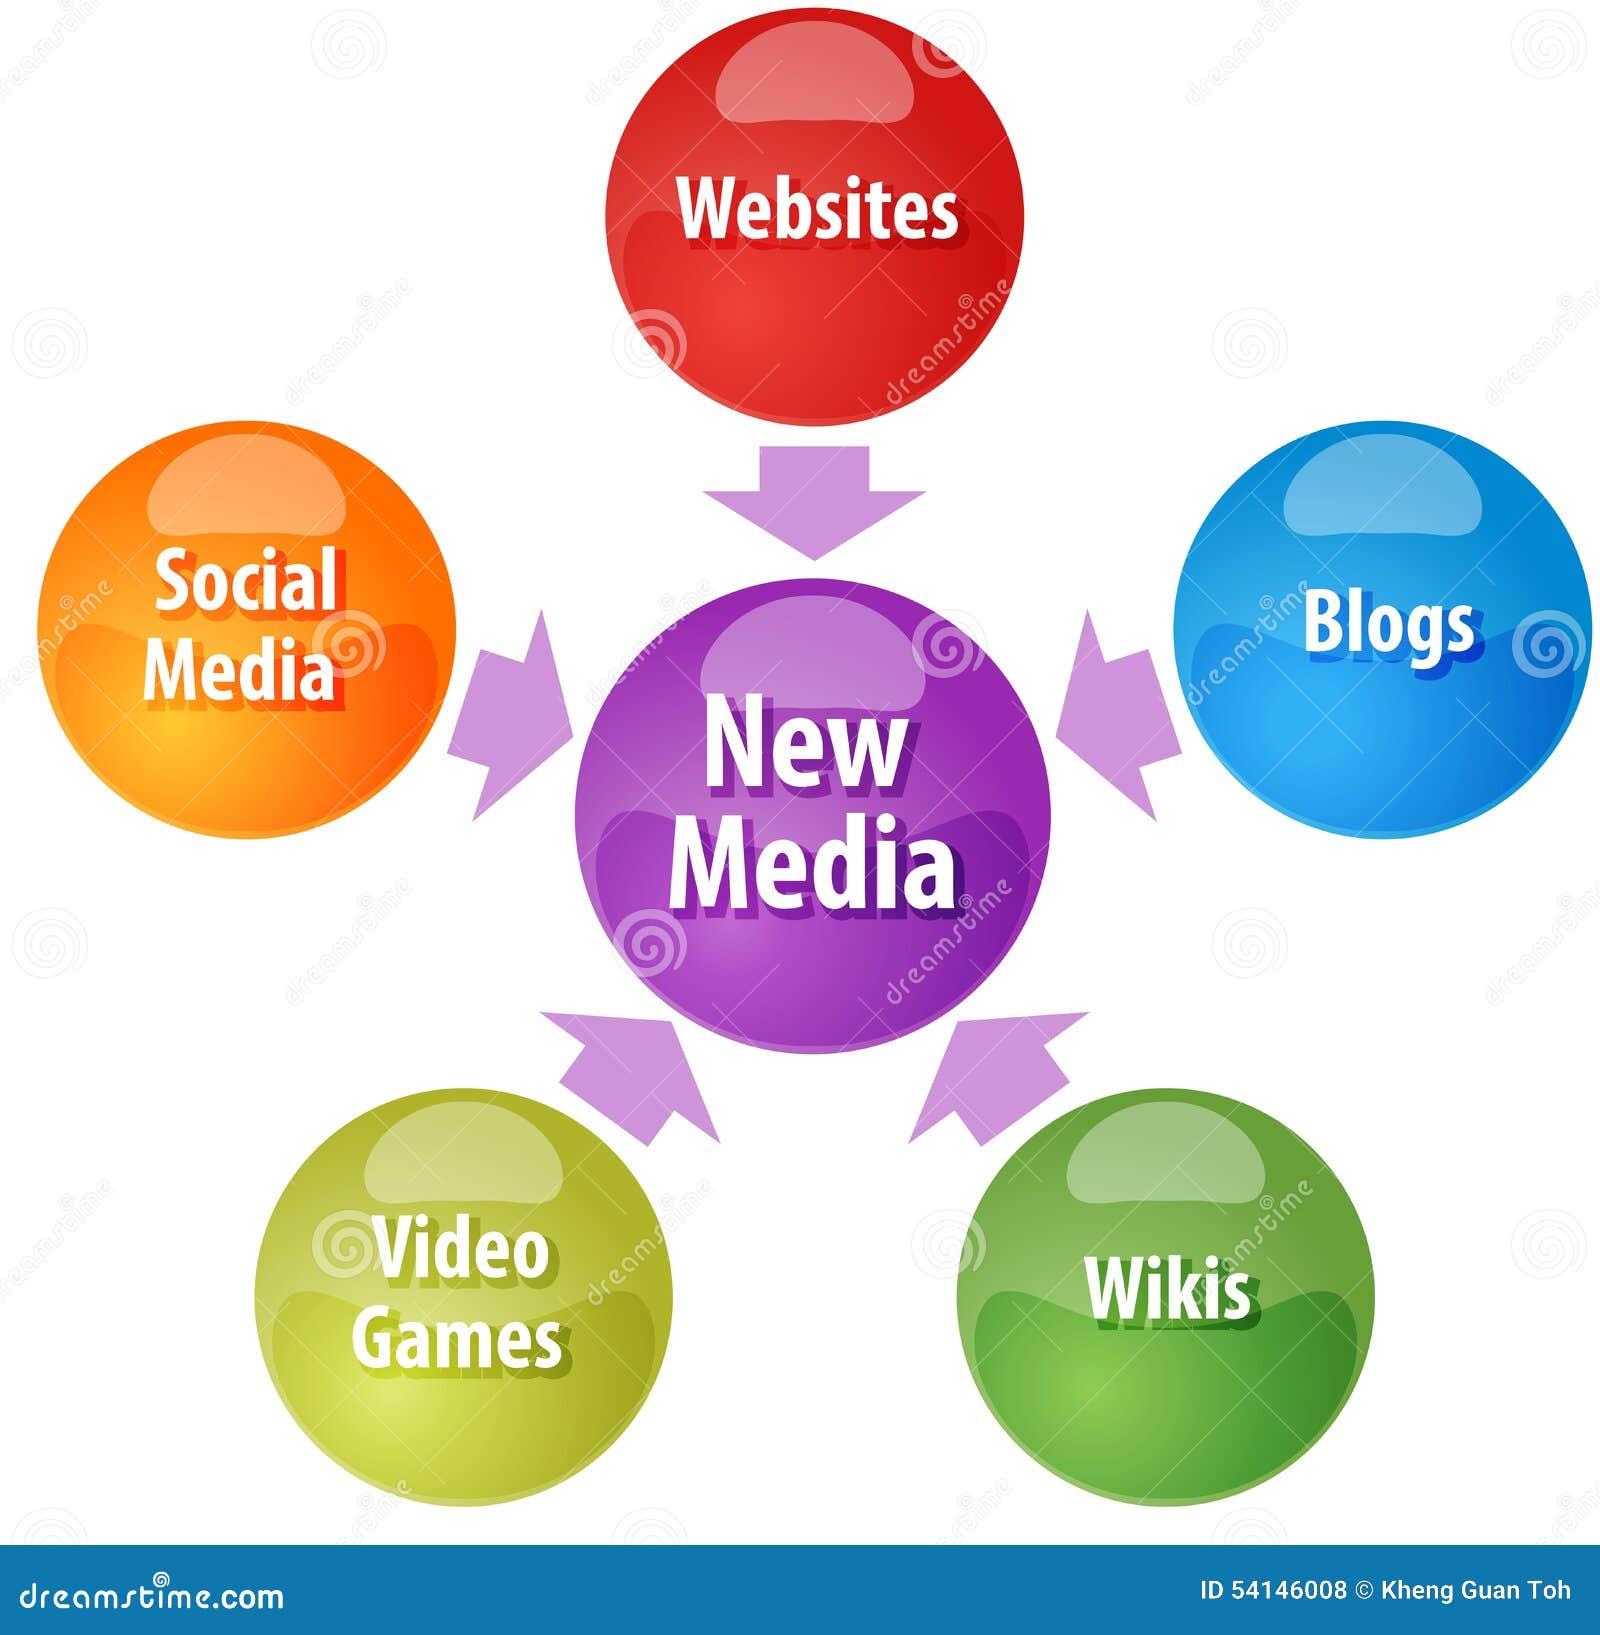 New media business diagram illustration stock illustration new media business diagram illustration ccuart Images